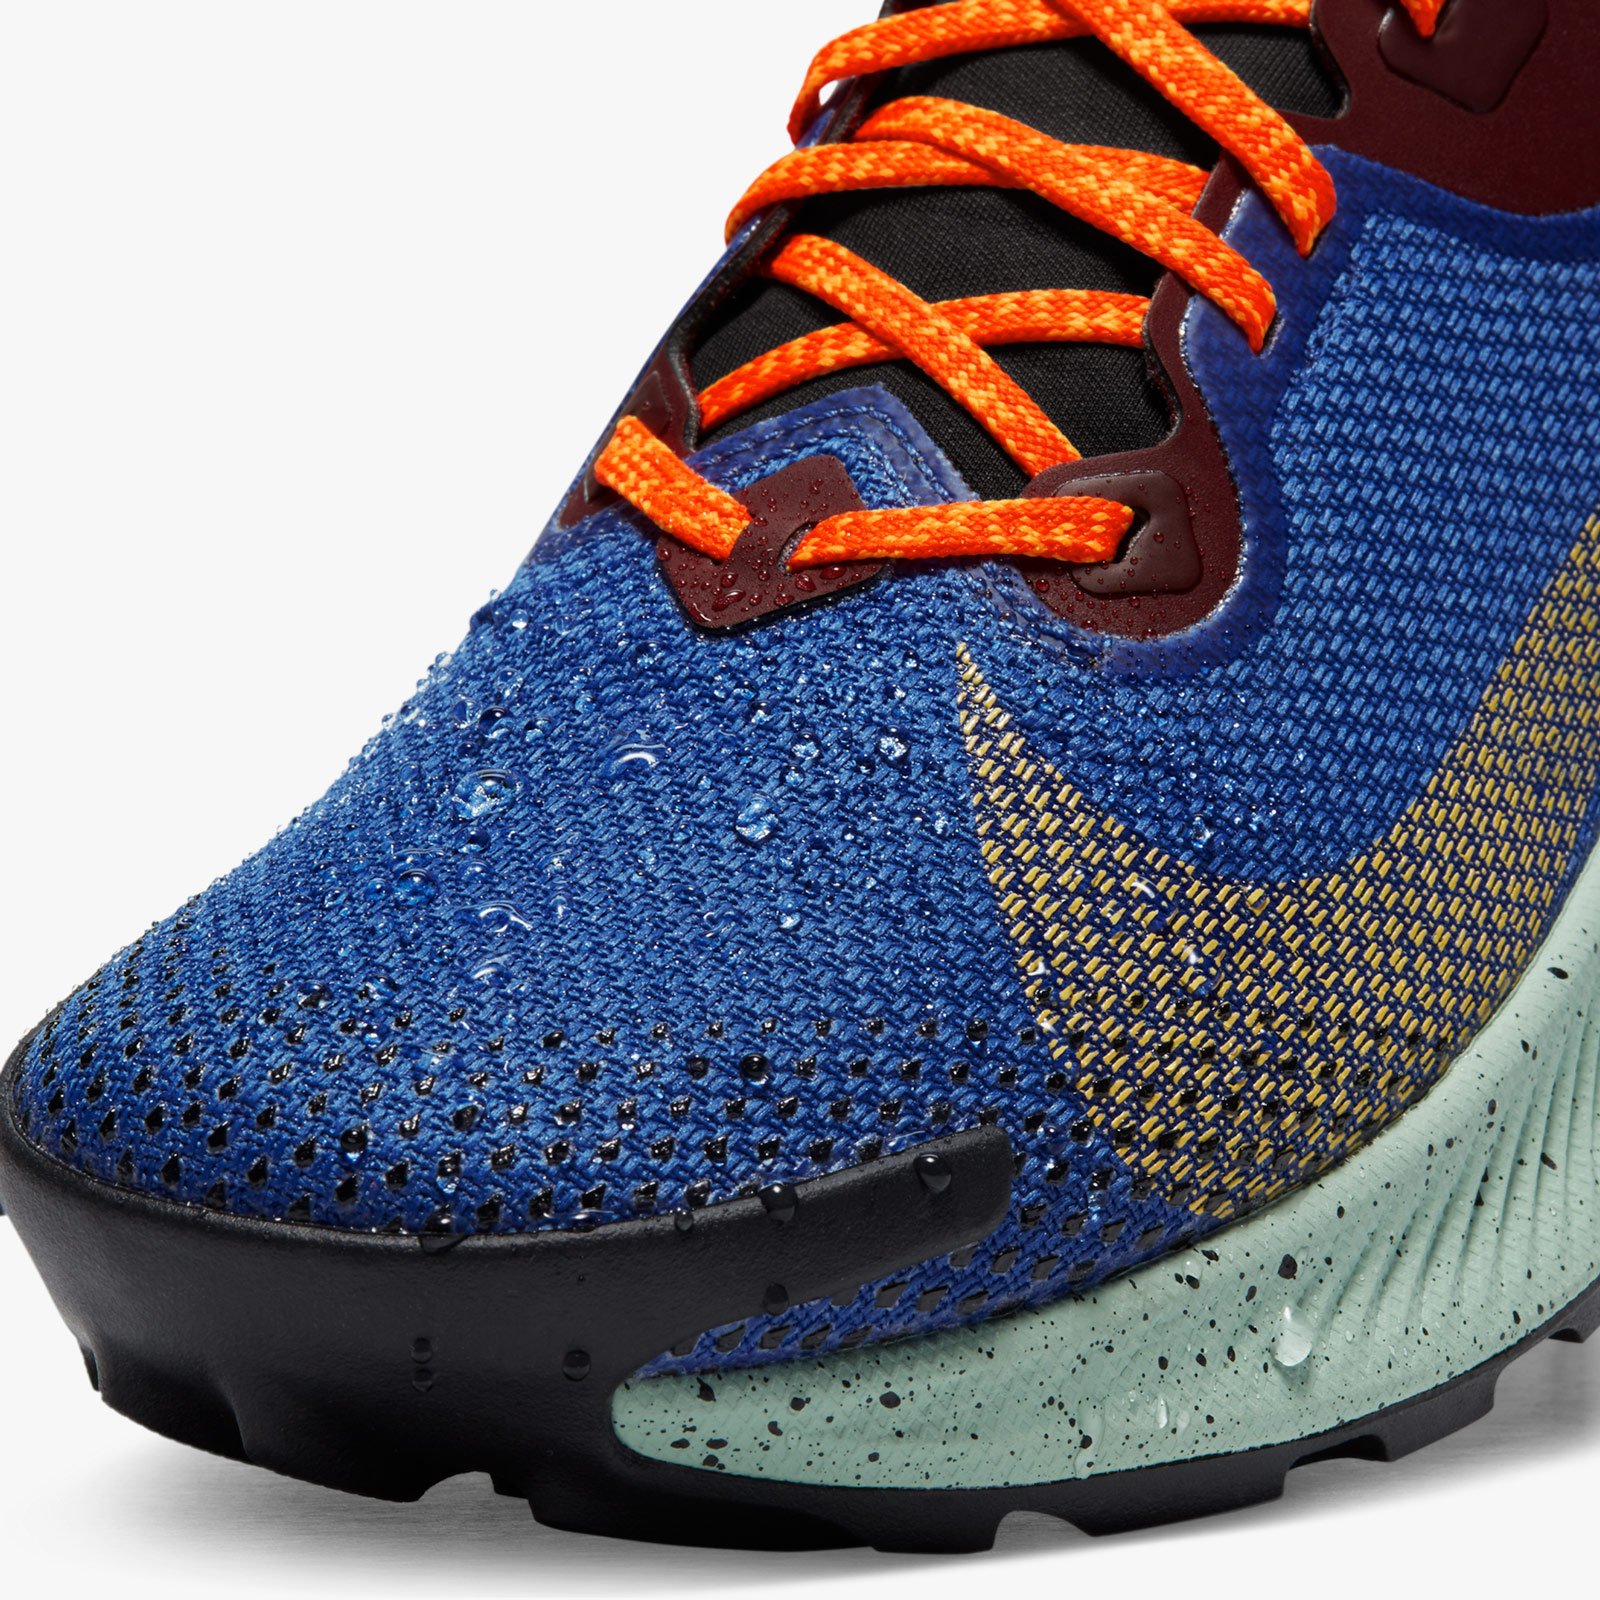 Nike Wmns Pegasus Trail 2 Gore-Tex - Cu2018-600 - SNS   sneakers ...